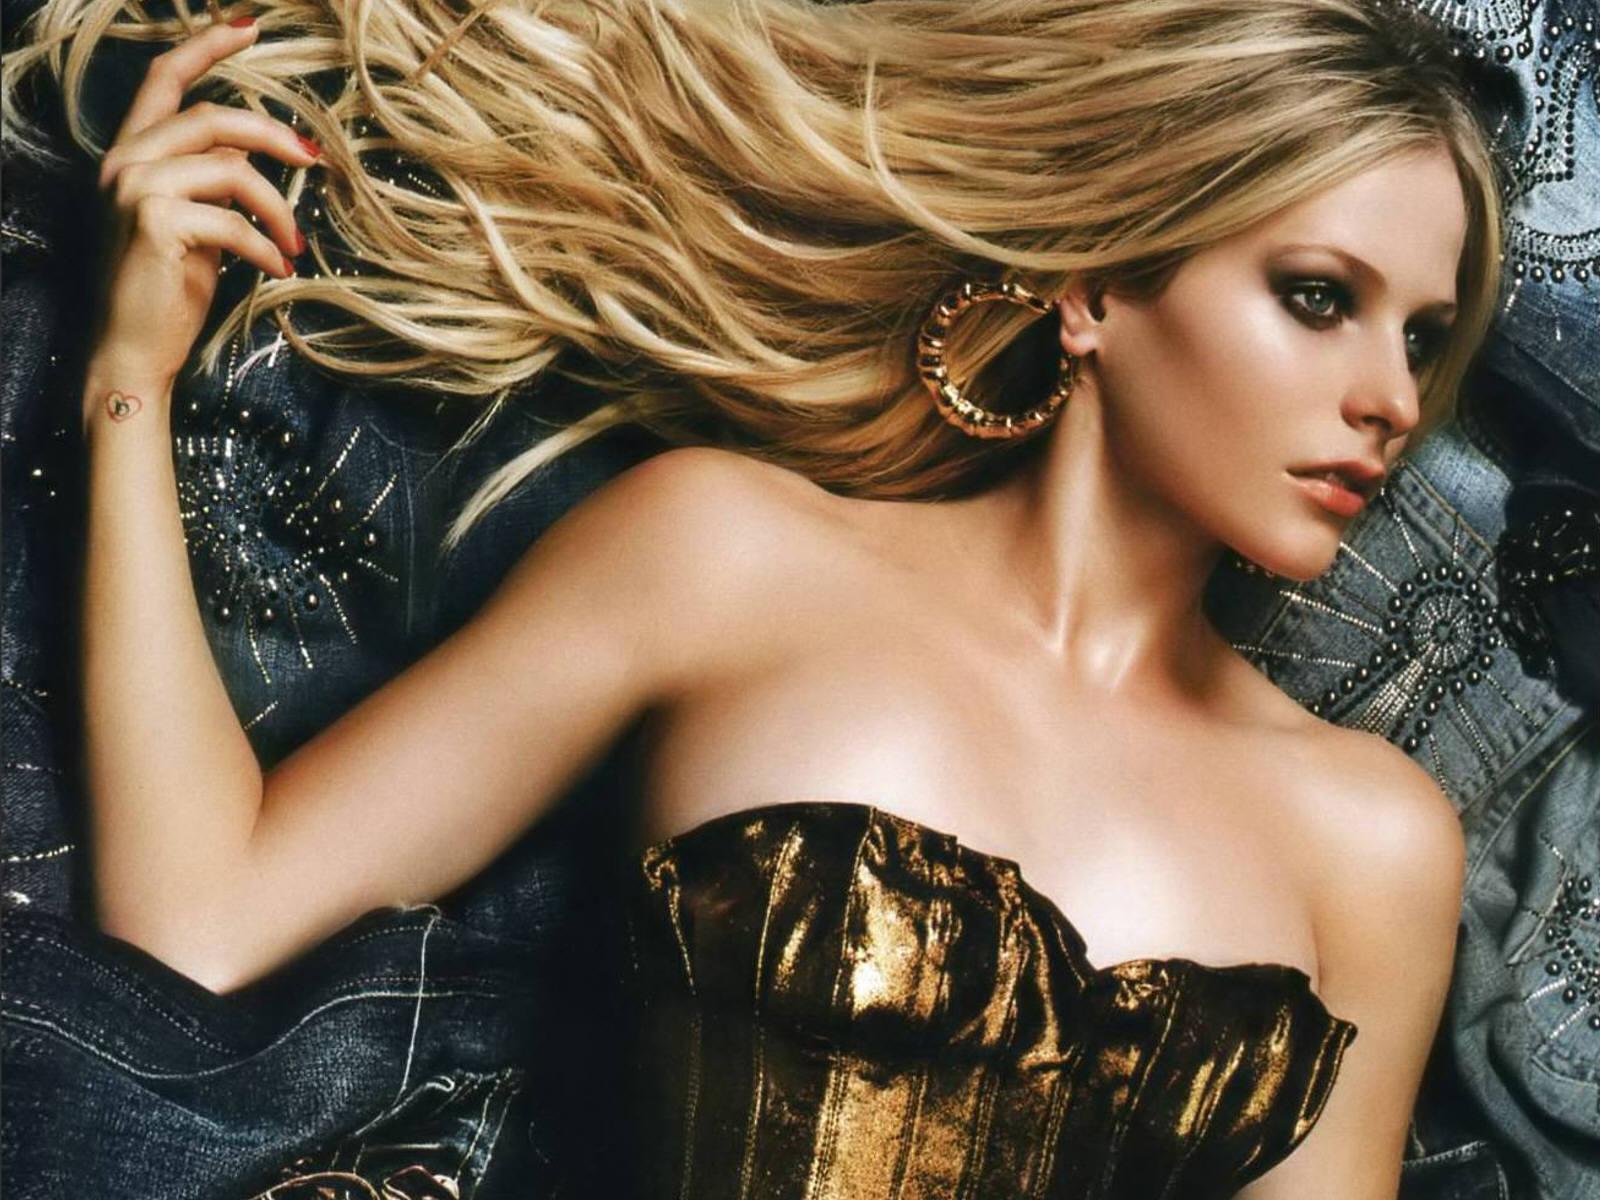 Avril Lavigne Wallpapers fancy